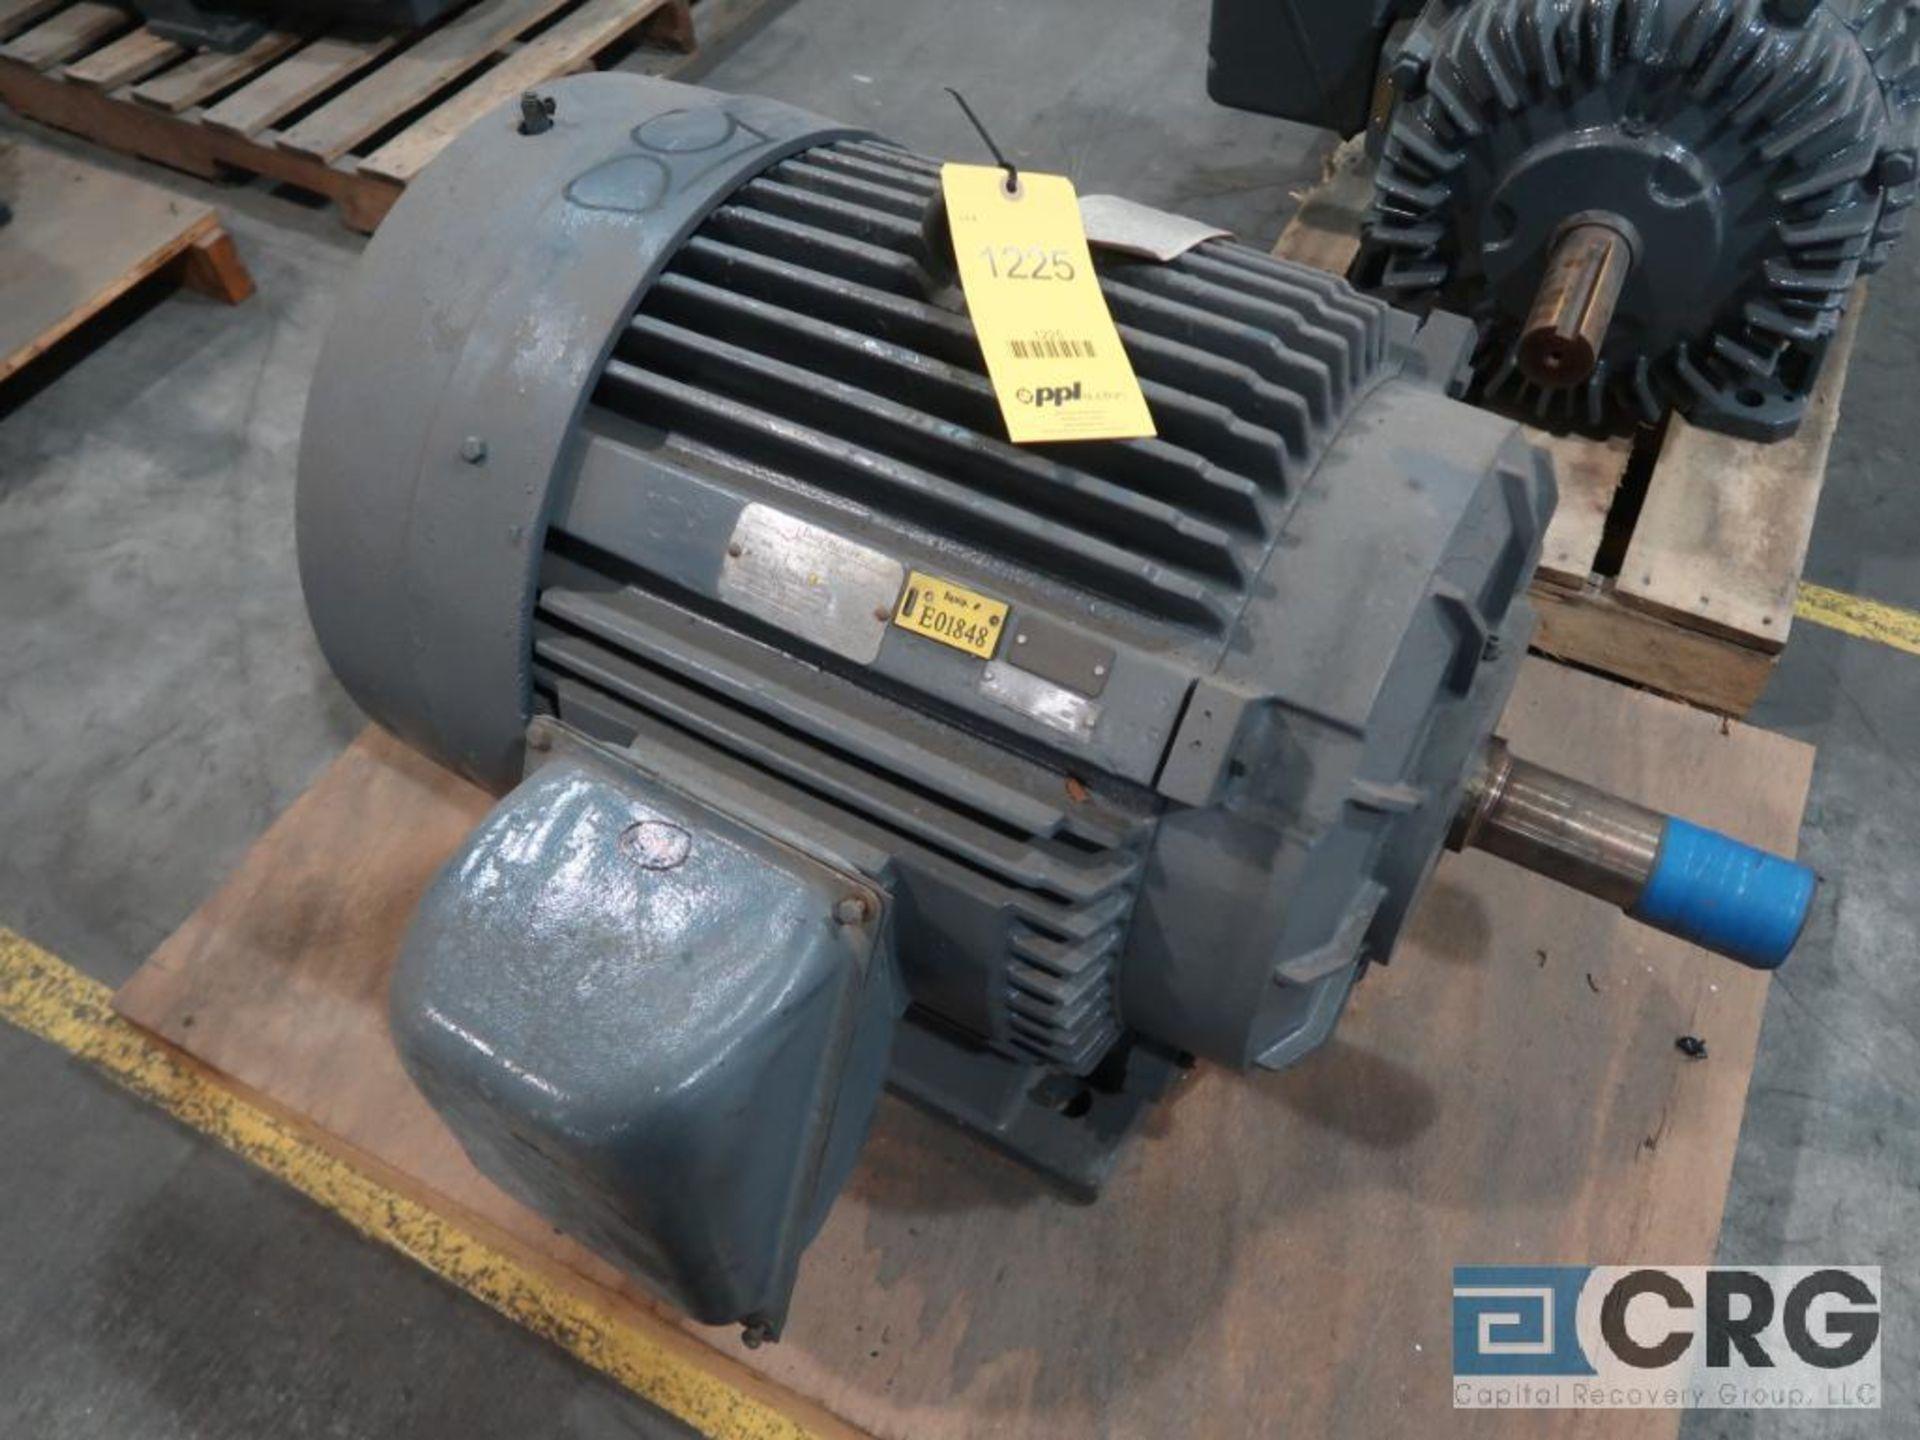 Reliance Duty Master motor, 50 HP, 1,180 RPMs, 440 volt, 3 ph., 405U frame (Finish Building)